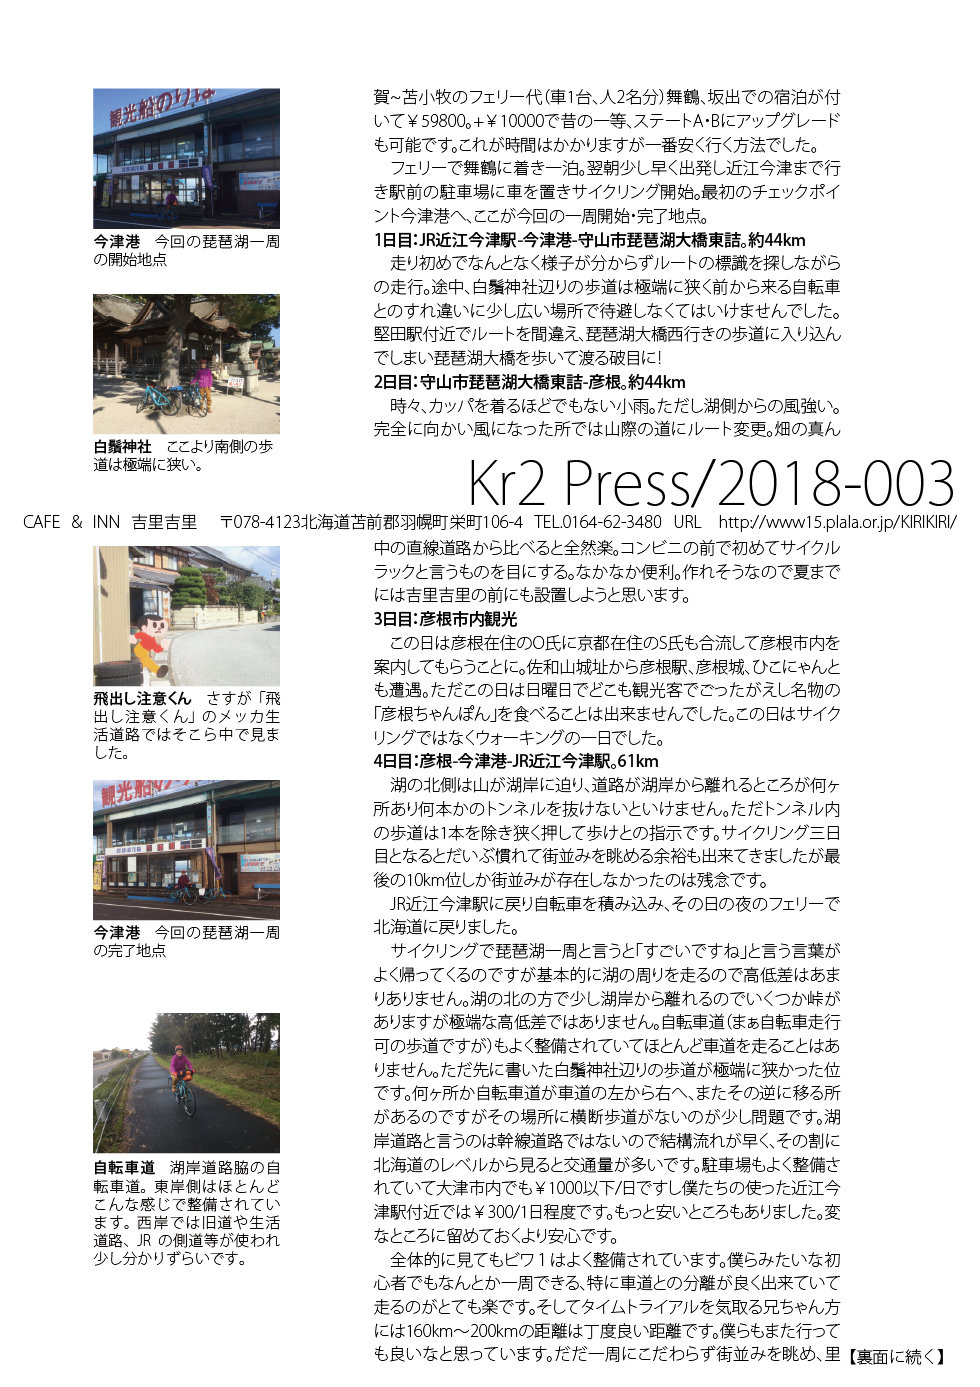 2018Kr2Press03.jpg